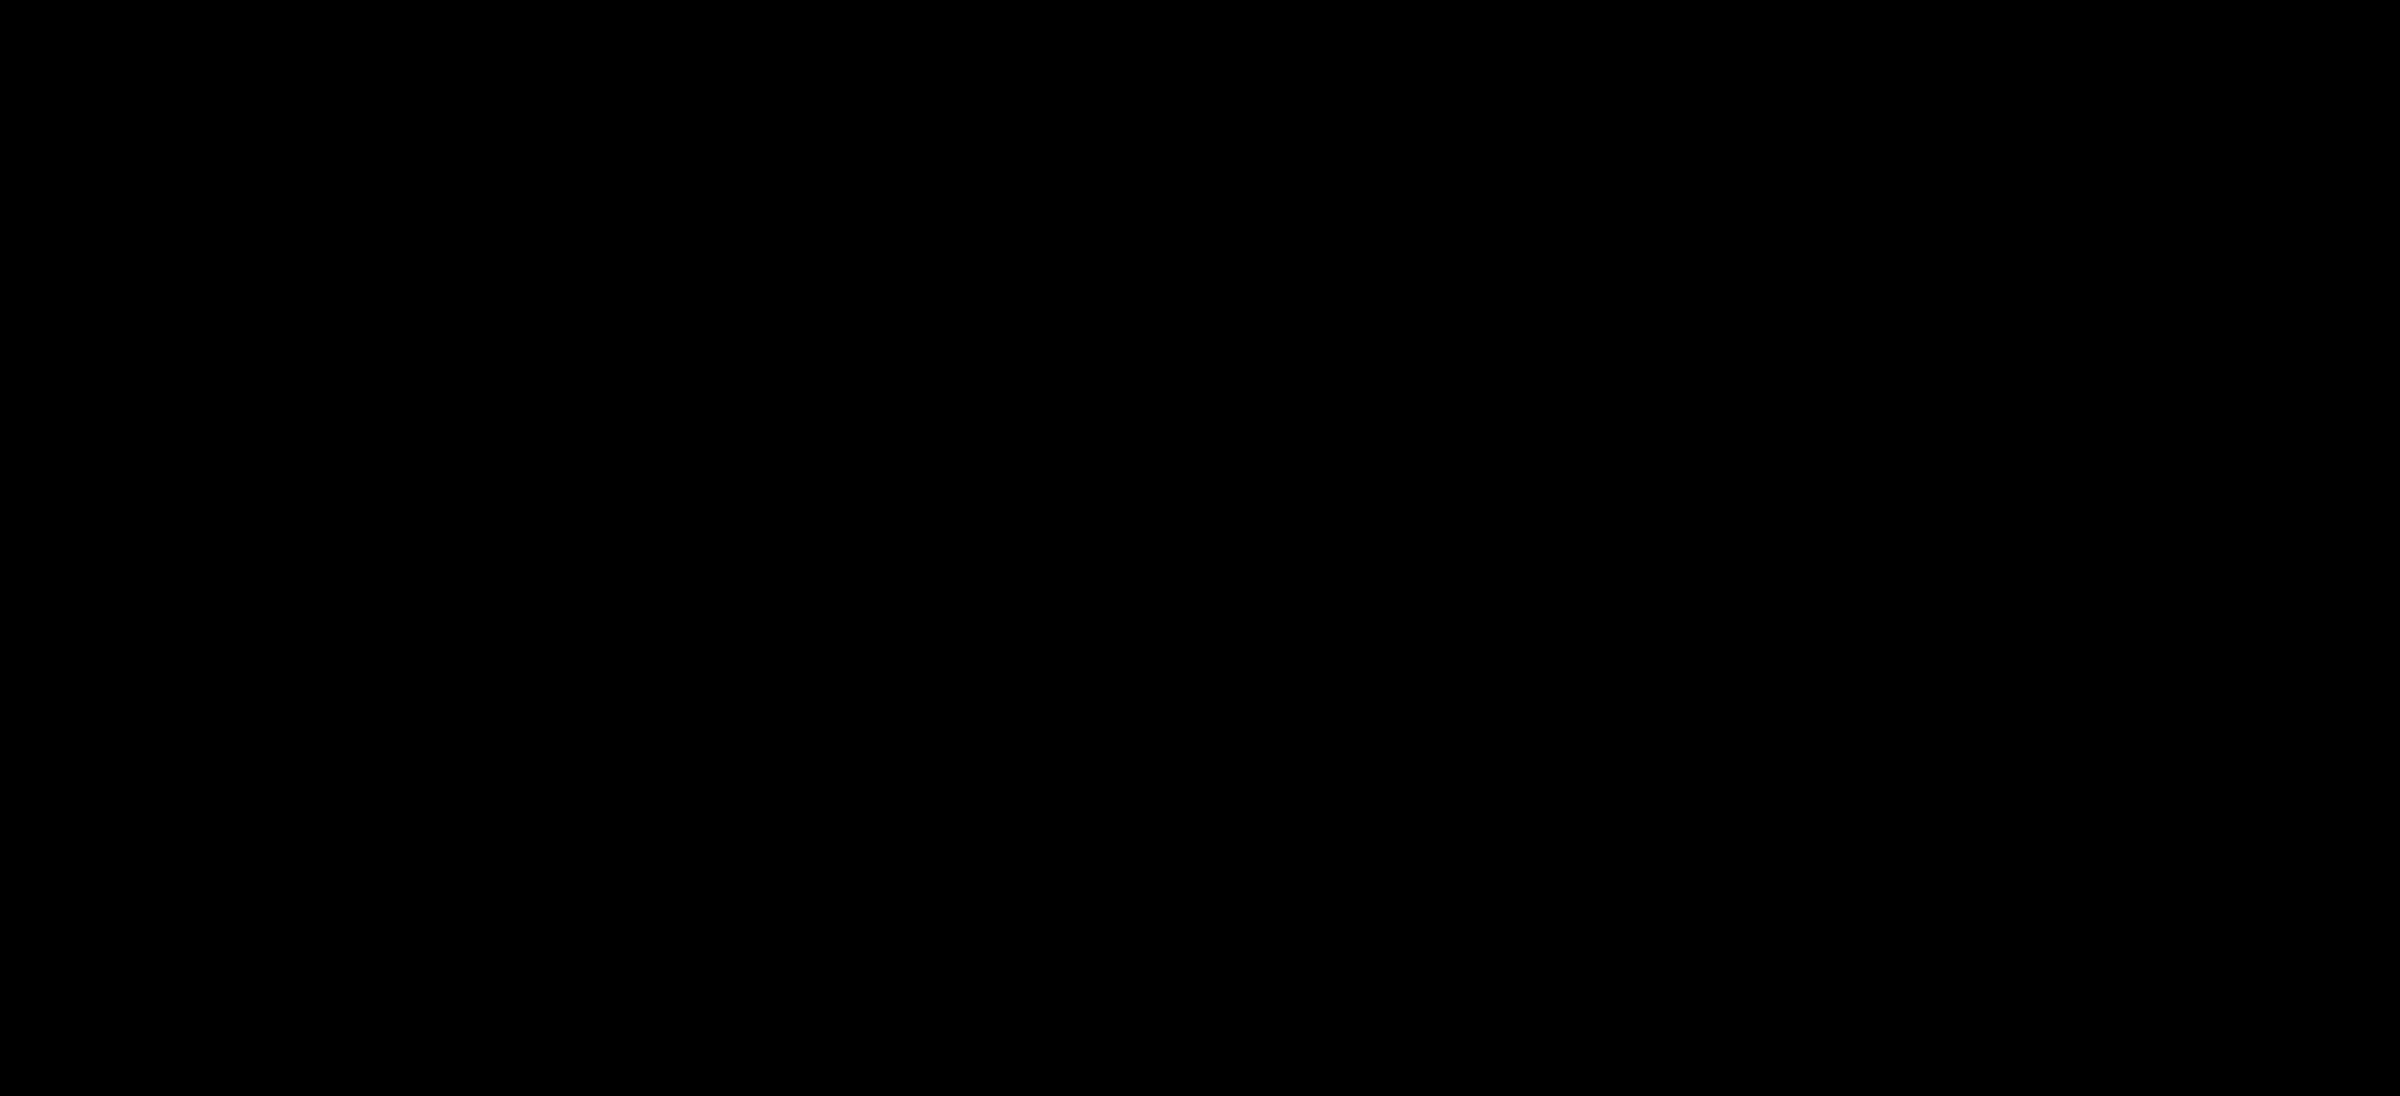 kro-ncrv-png-transparent-logo